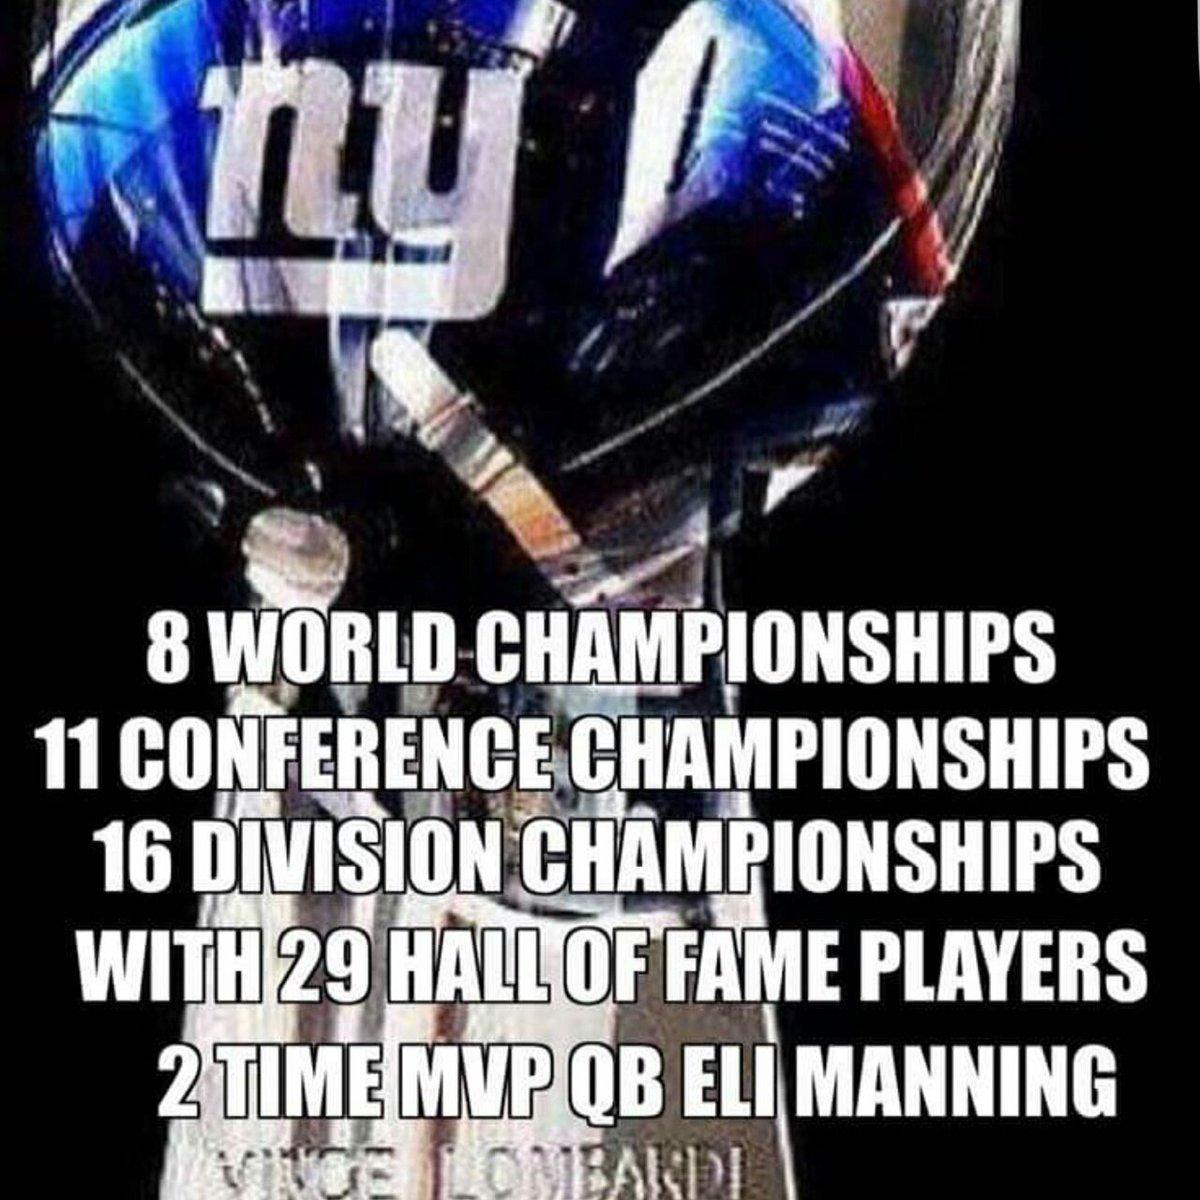 Can&#39;t wait for next season... #GIANTS #GiantsPride <br>http://pic.twitter.com/EU3lw7B7zH